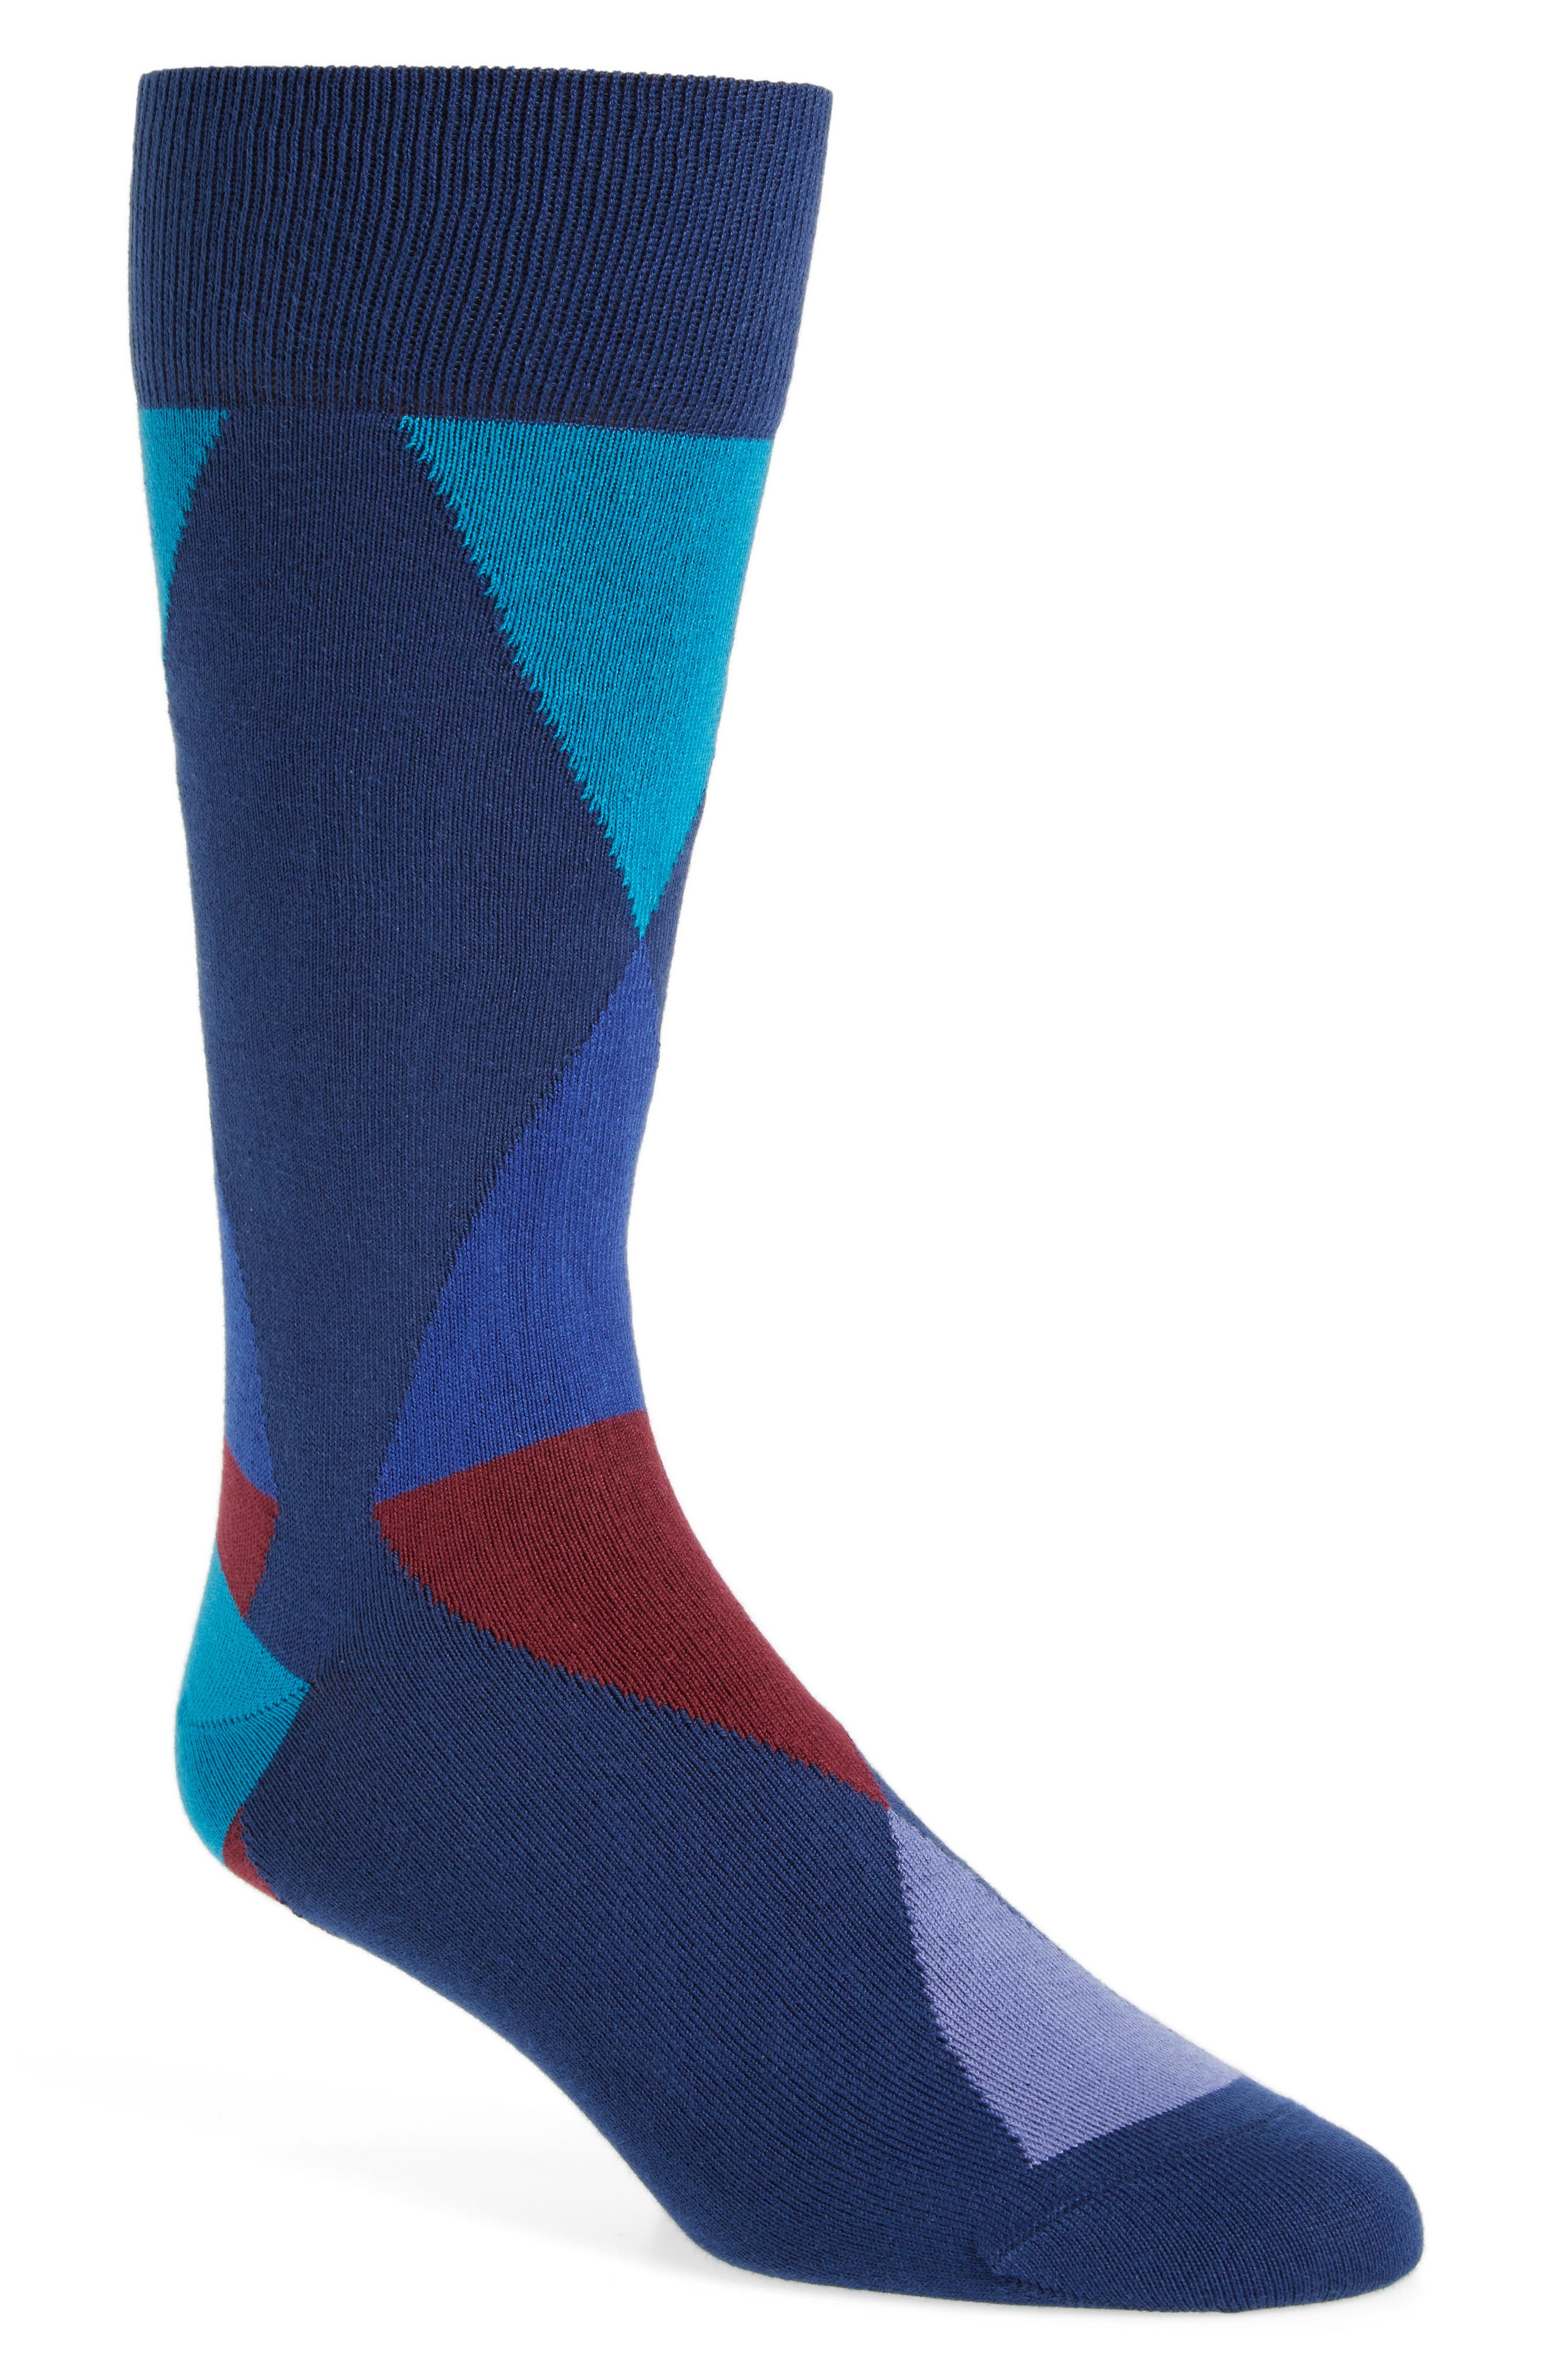 Geo Geometric Socks,                         Main,                         color, 400